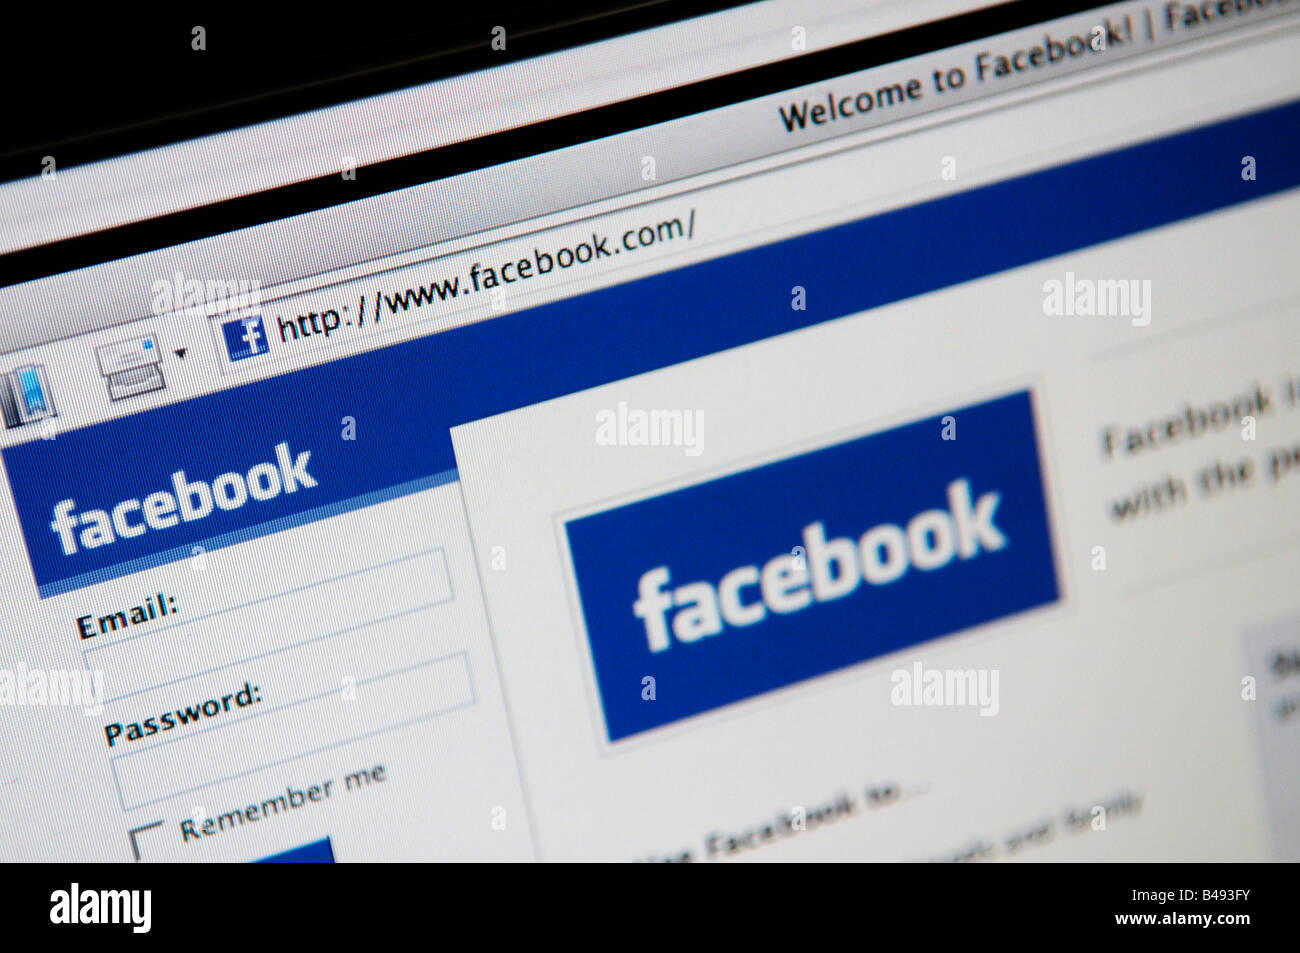 Login pp page home com facebook www Facebook login